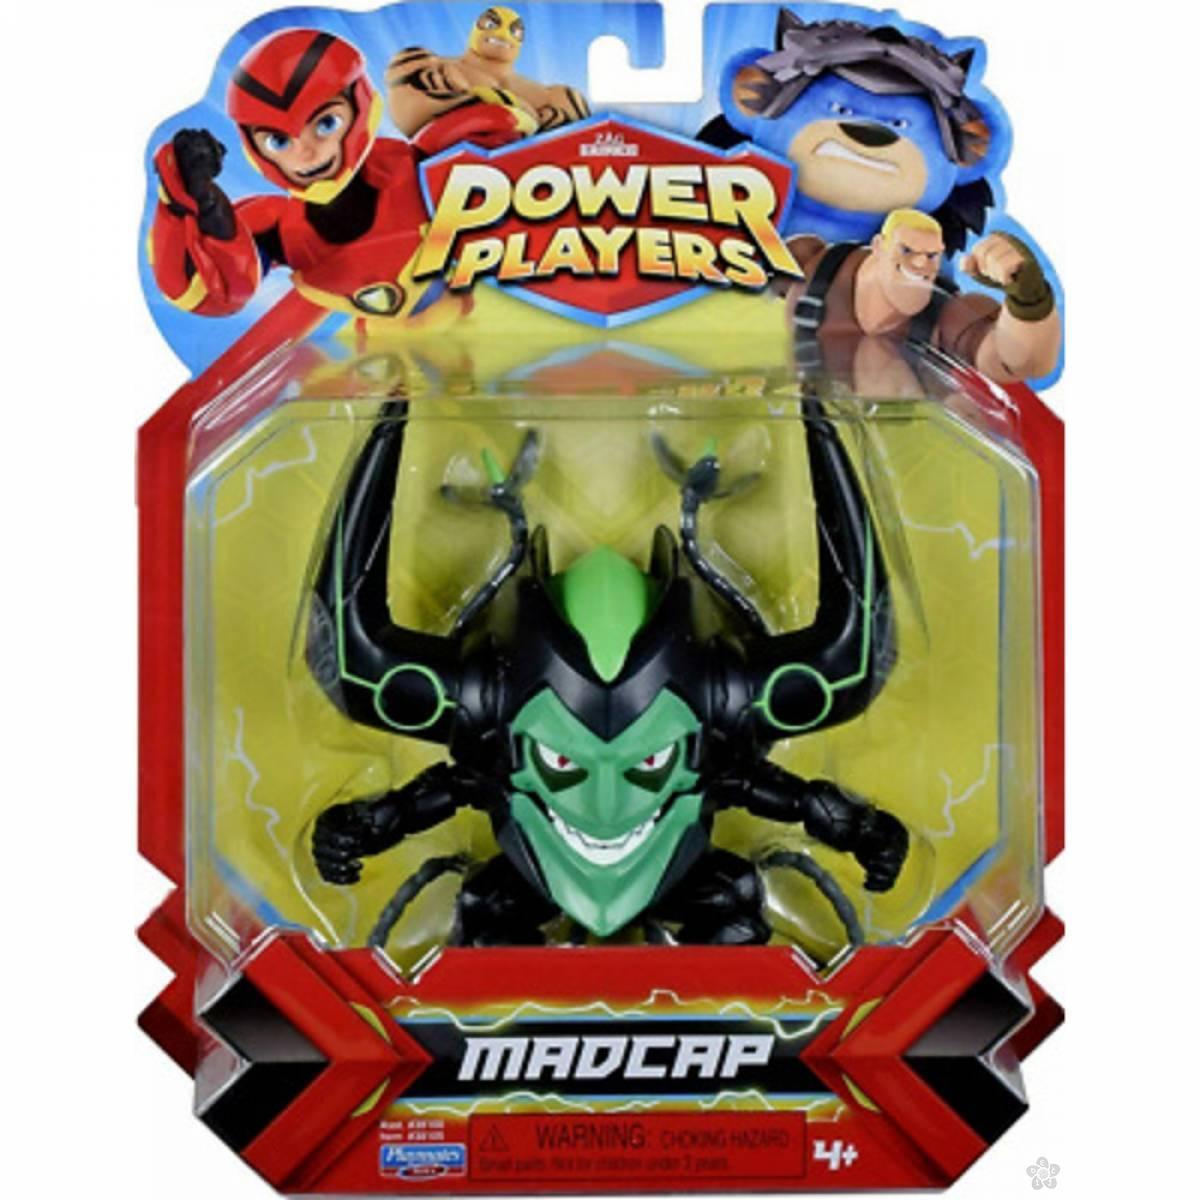 Akciona figrura Power Players Madcap 38155